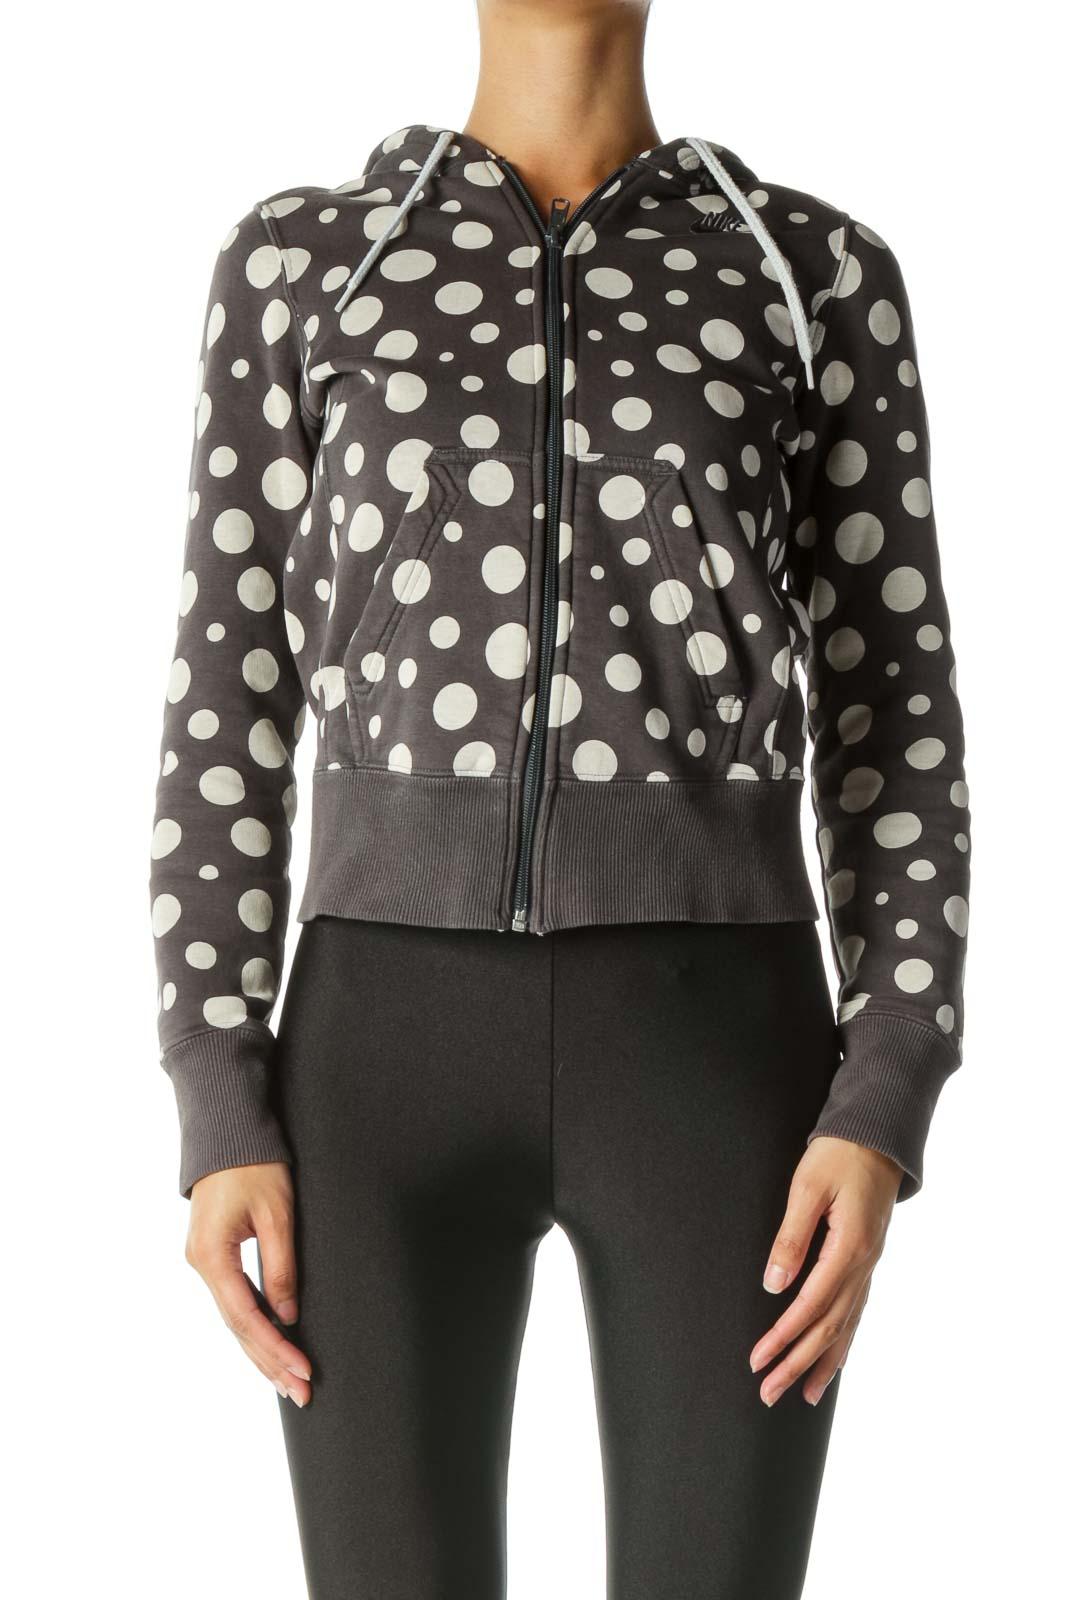 Gray and Cream Polka-Dot Jacket